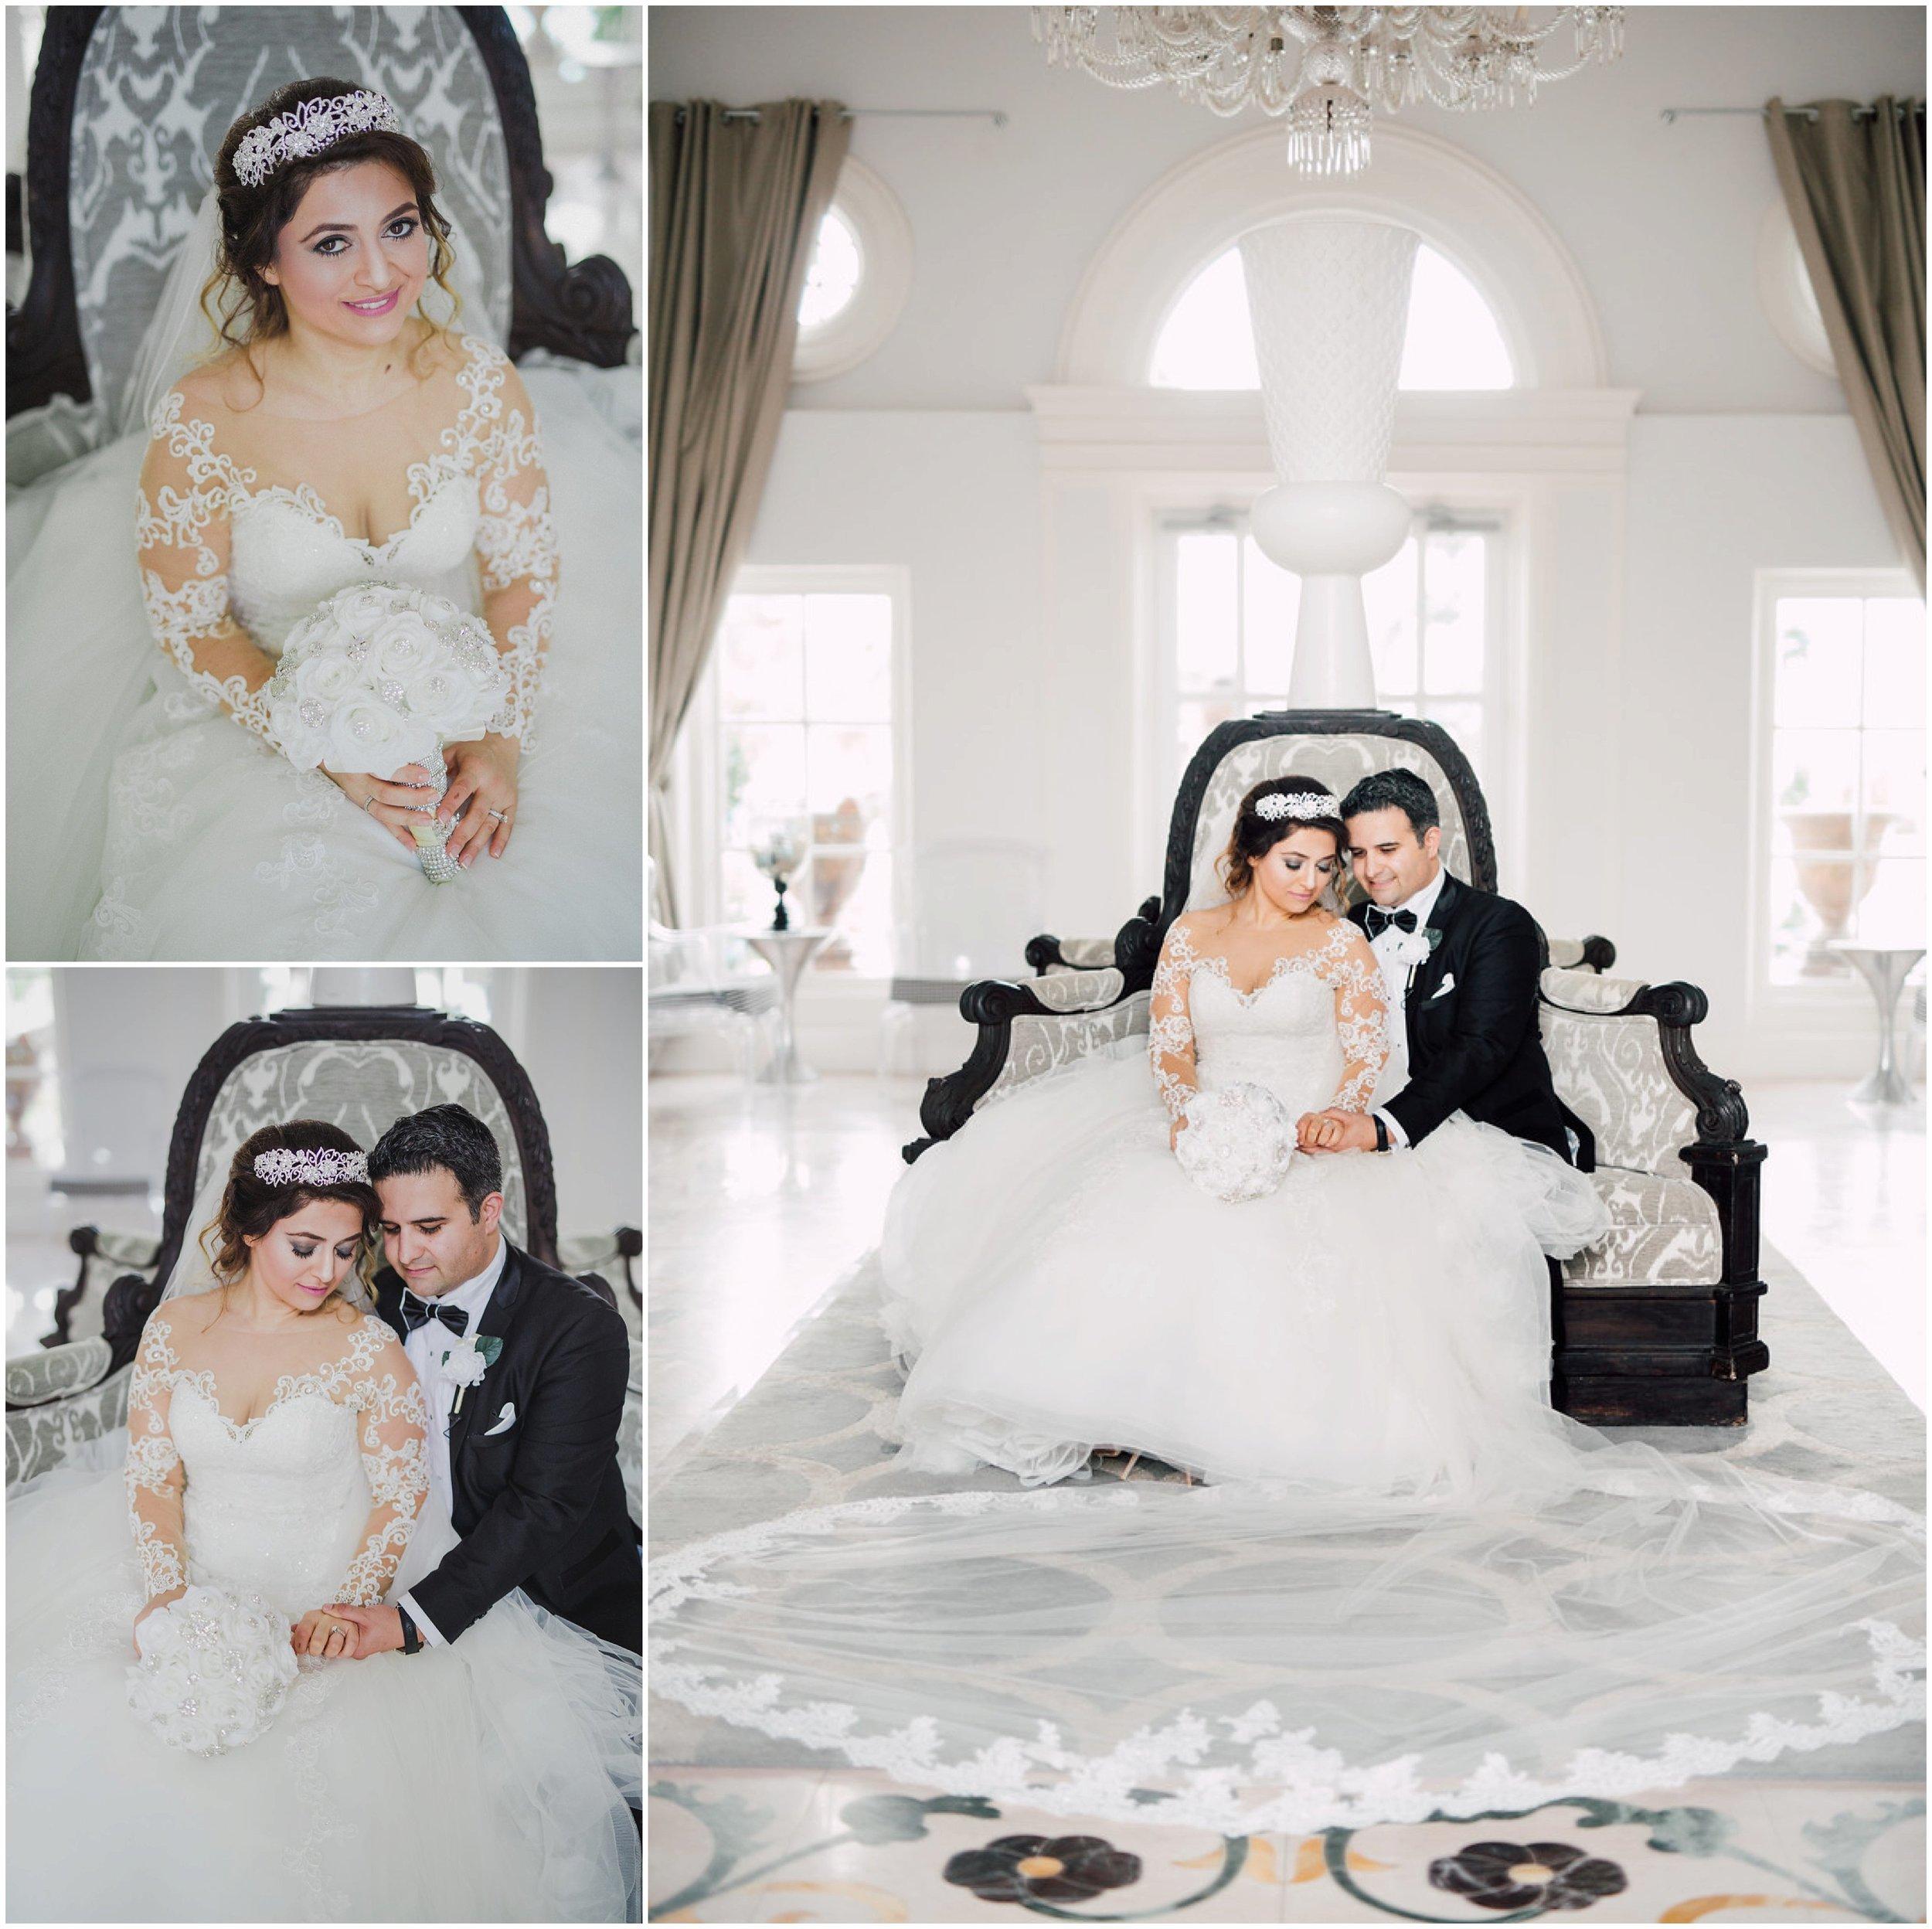 Le Cape Weddings- Destination Wedding Photography -ShayanandNikkie-255-X3_LuxuryDestinationPhotographer.jpg